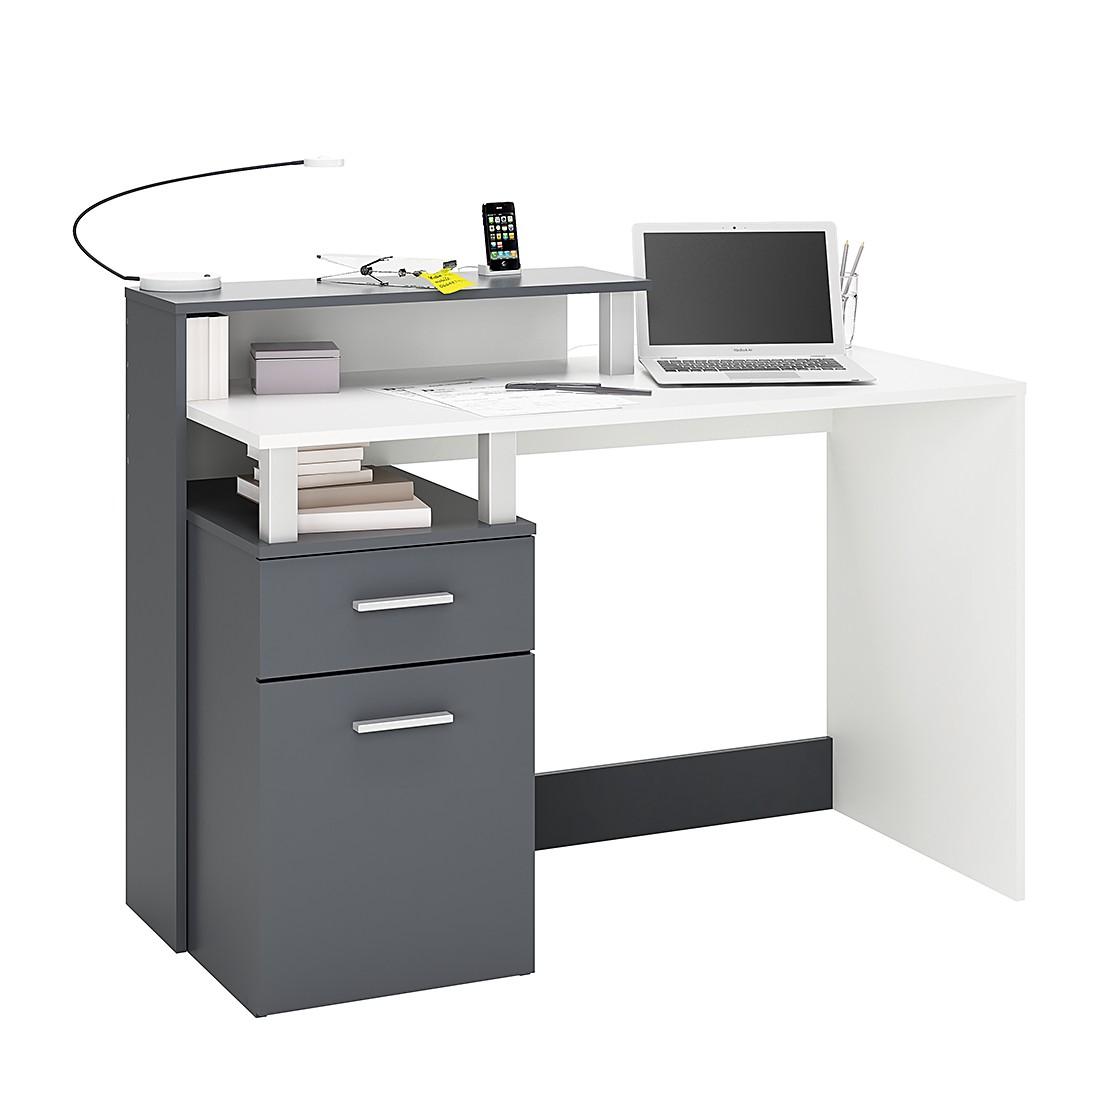 Büromöbel weiss grau  Büromöbel online günstig kaufen über shop24.at | shop24